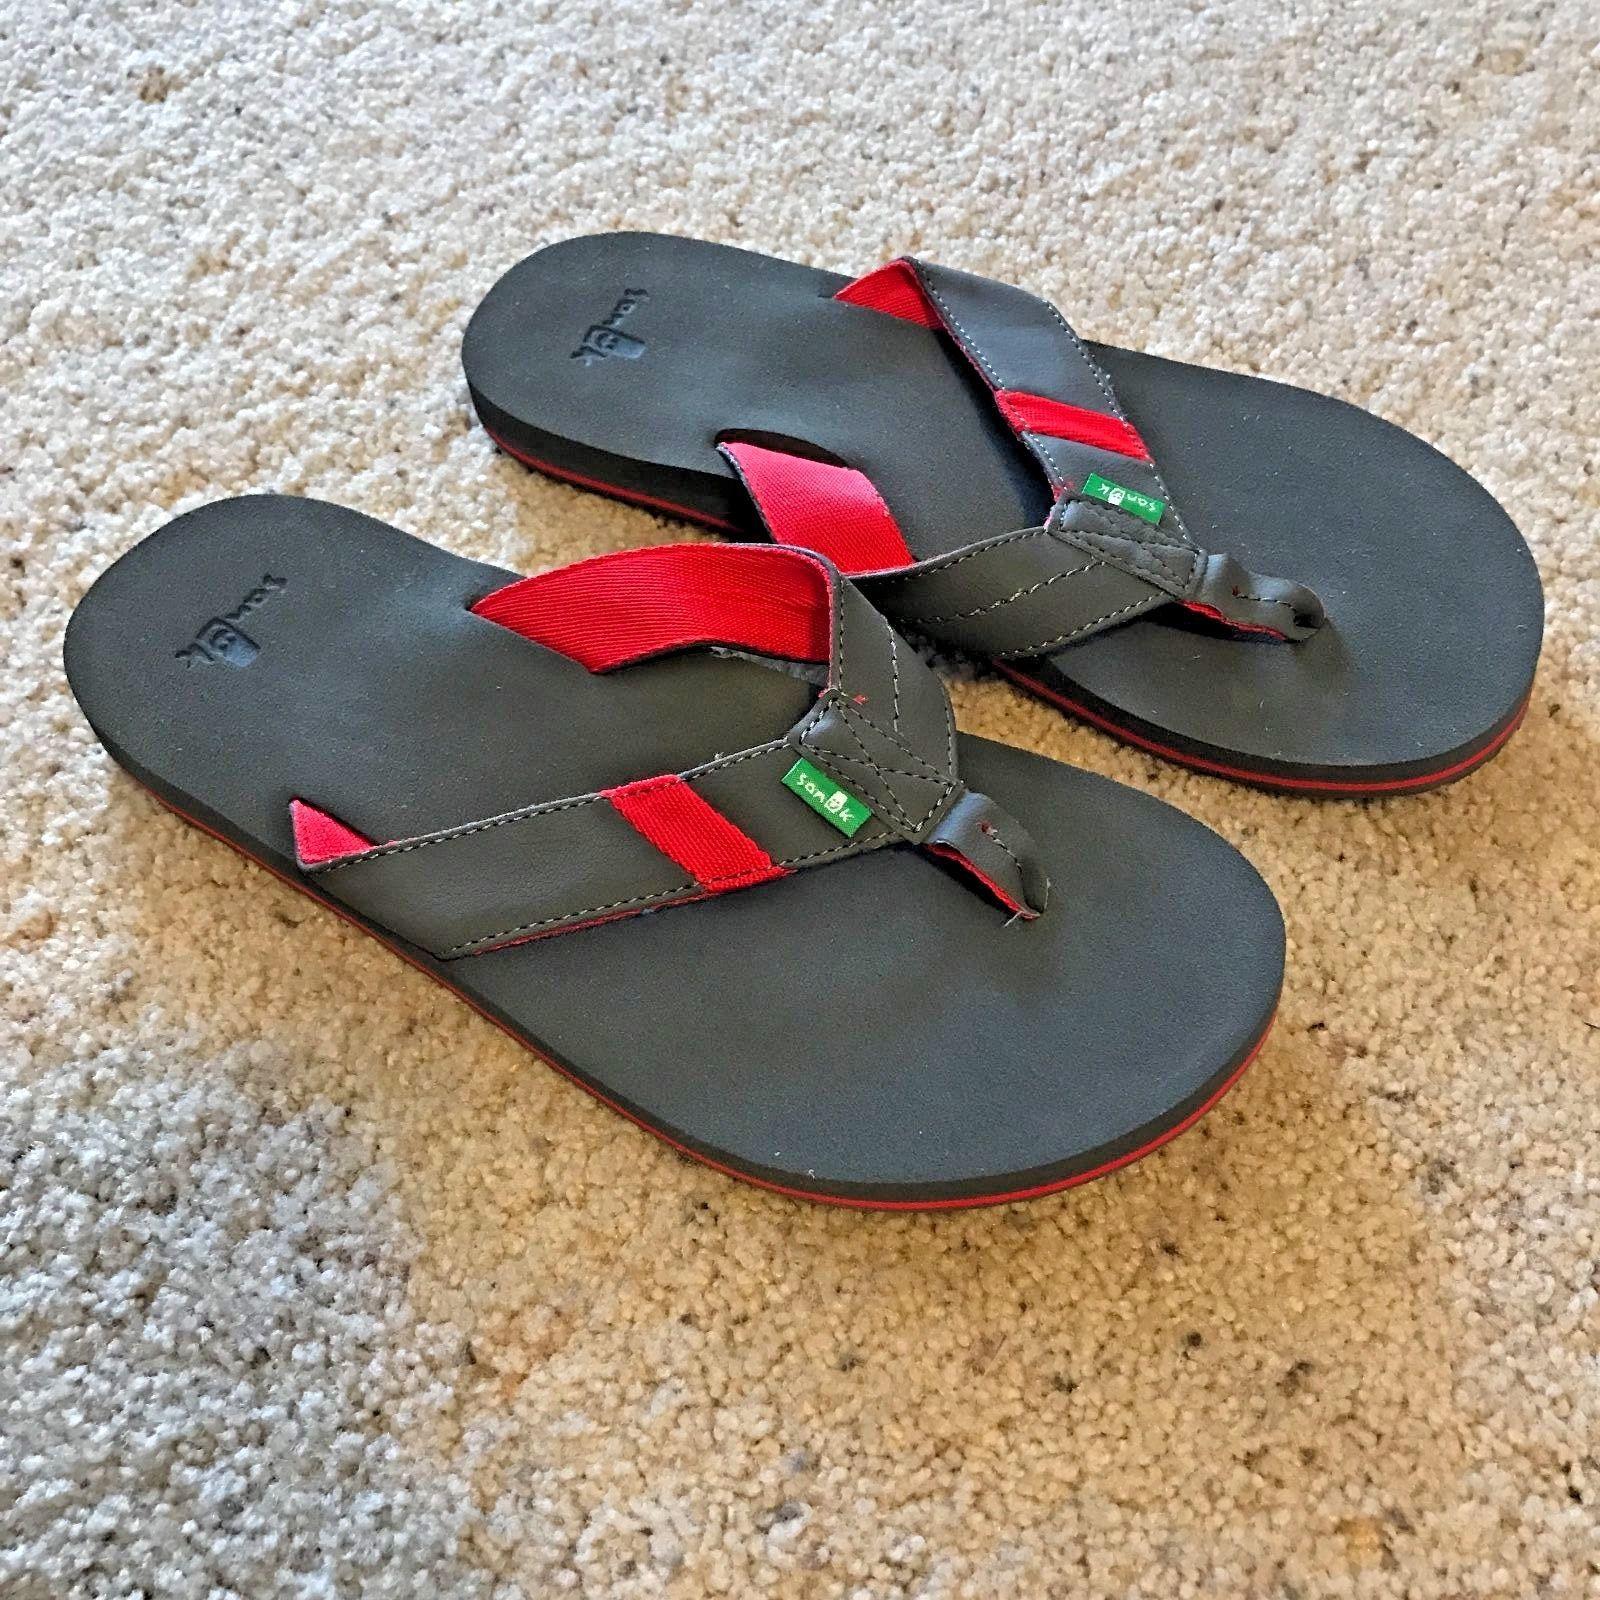 ea8f486a865e9 SANUK JET STREAM Flip Flops Grey/Red Men's - 9 - Thong Sandal Shoes Flip  Flops